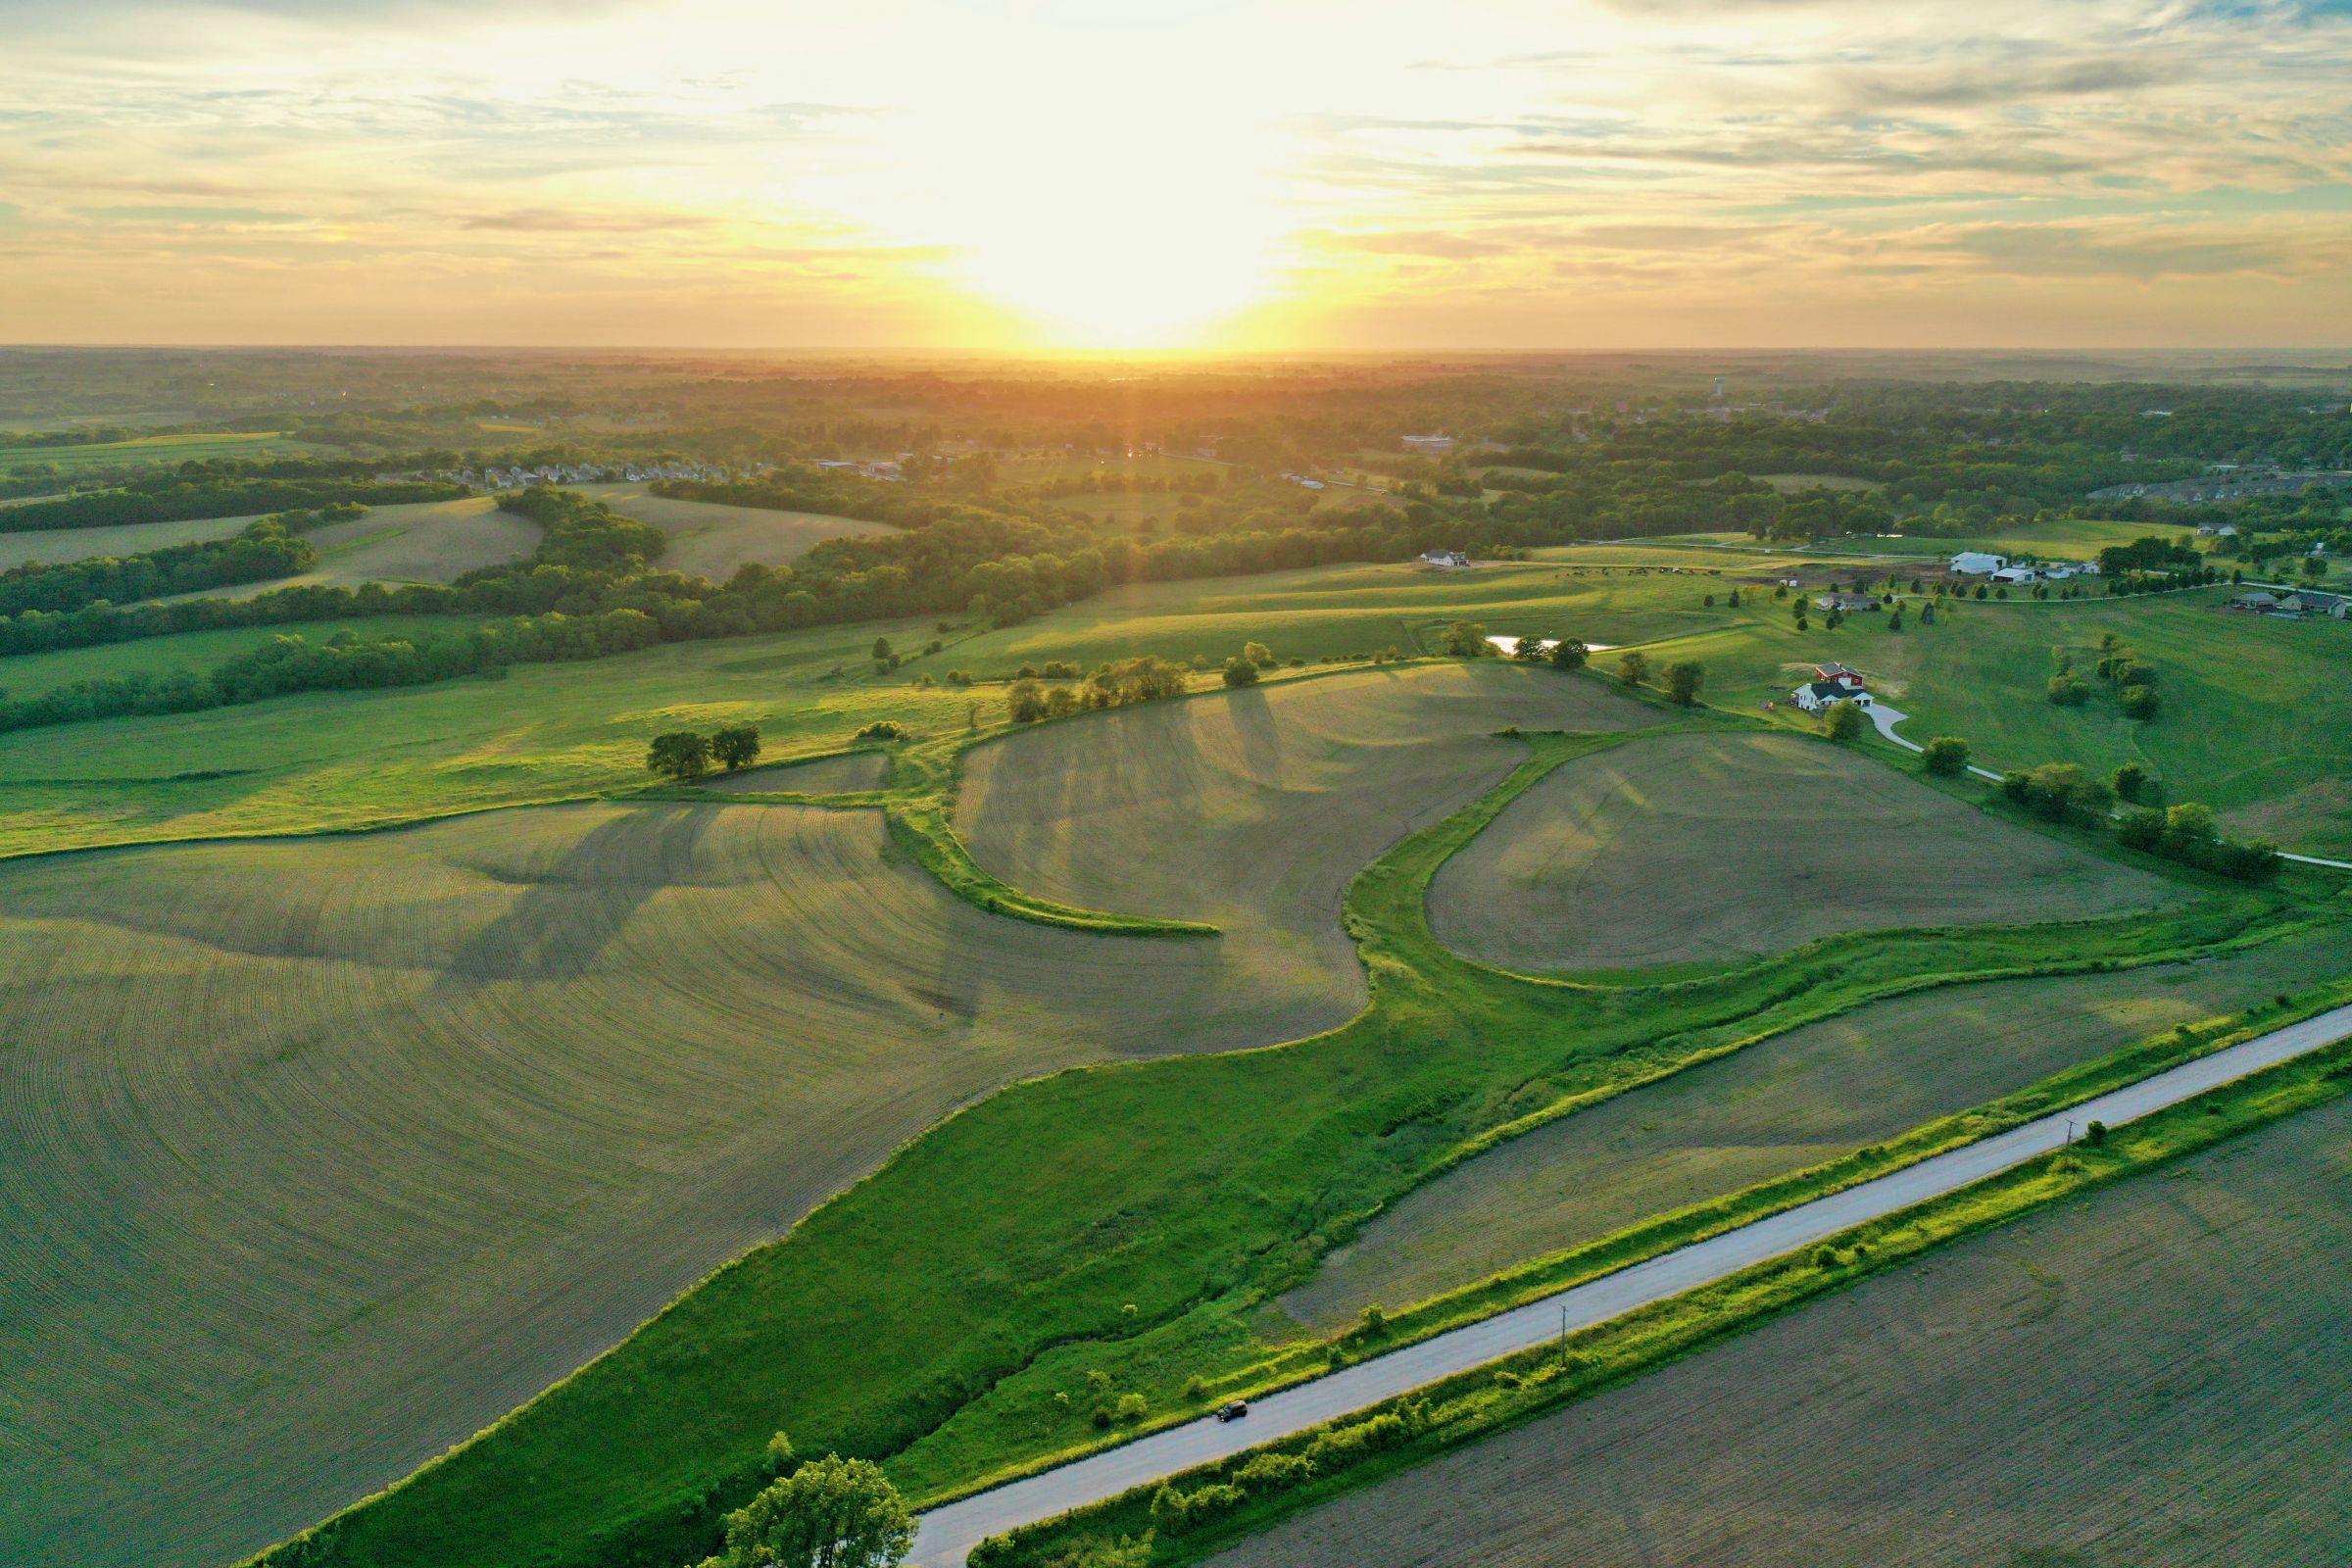 development-land-warren-county-iowa-20-acres-listing-number-15424-0-2021-03-25-201452.JPG